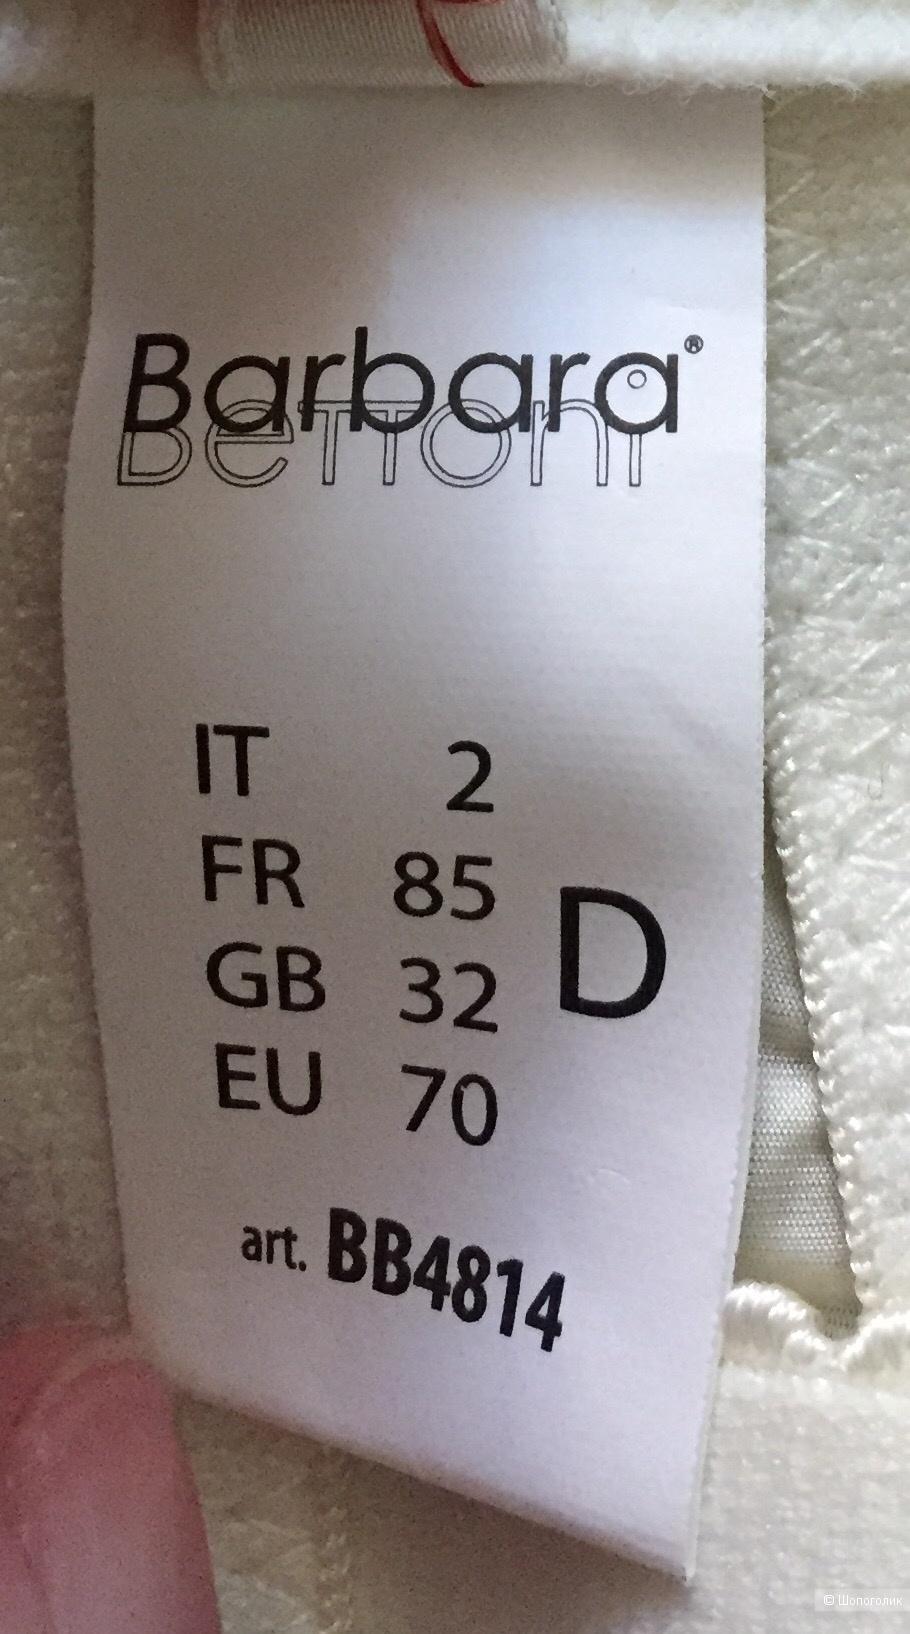 Бюстгальтер Barbara Bettoni размер 70 D